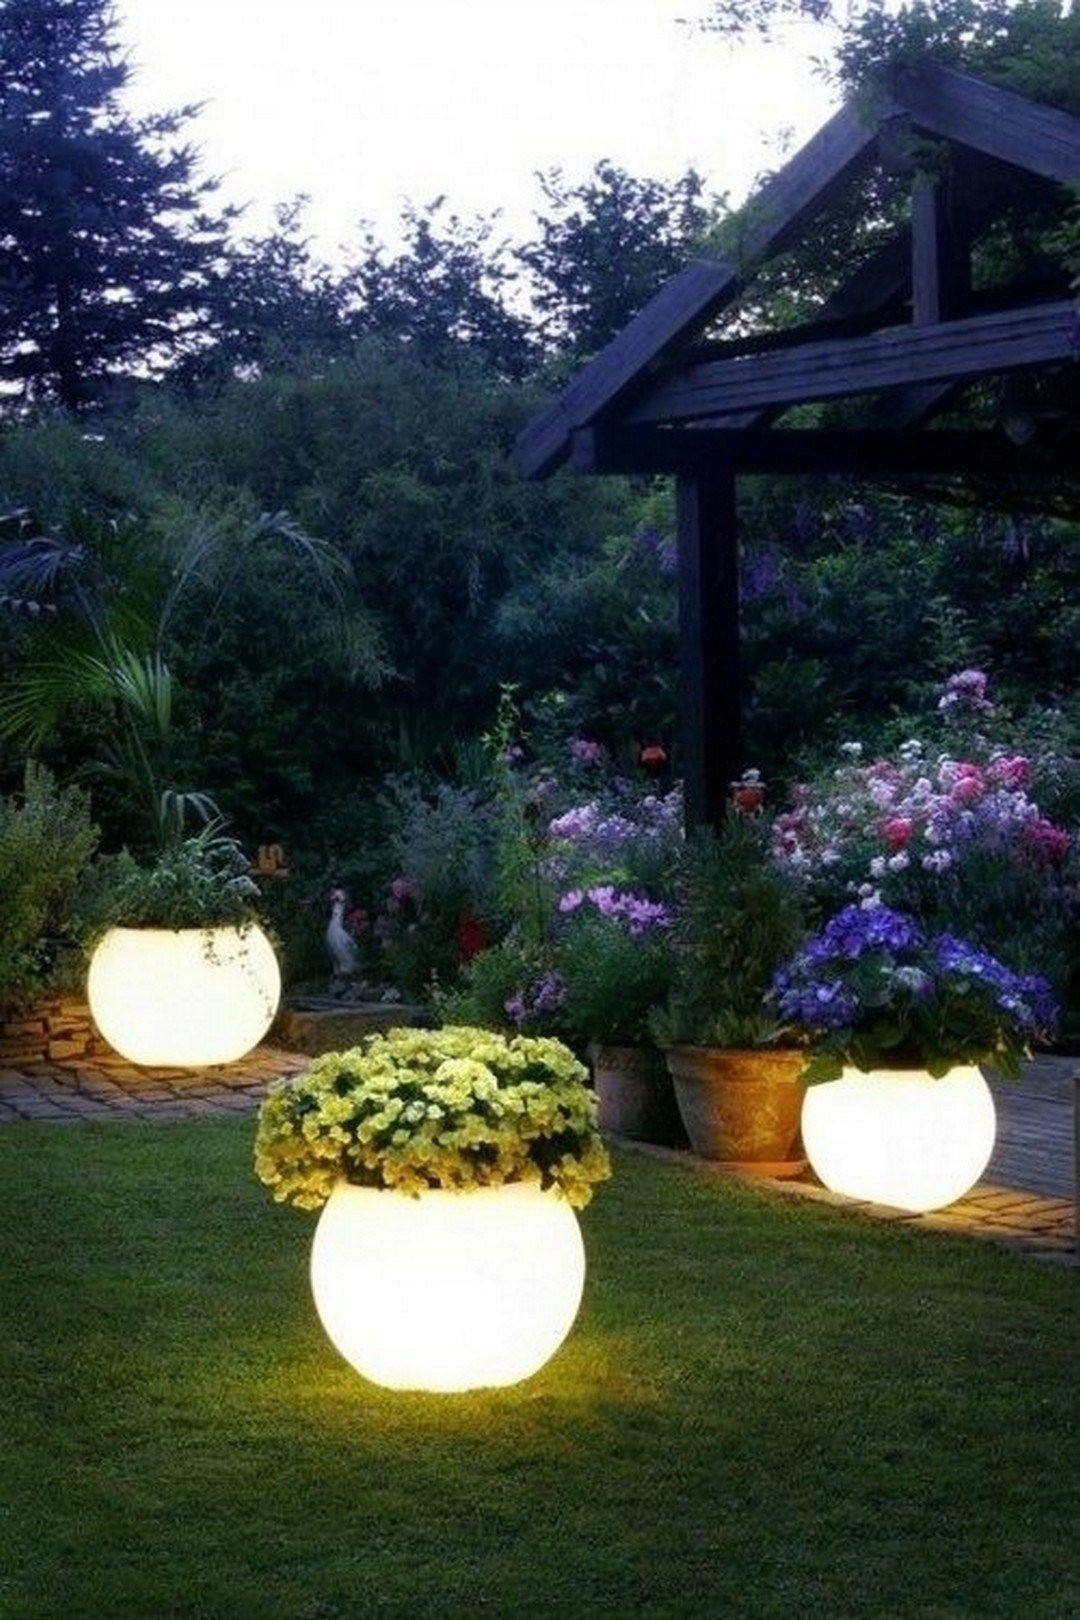 75 Brilliant Backyard Landscaping Design Ideas (17)